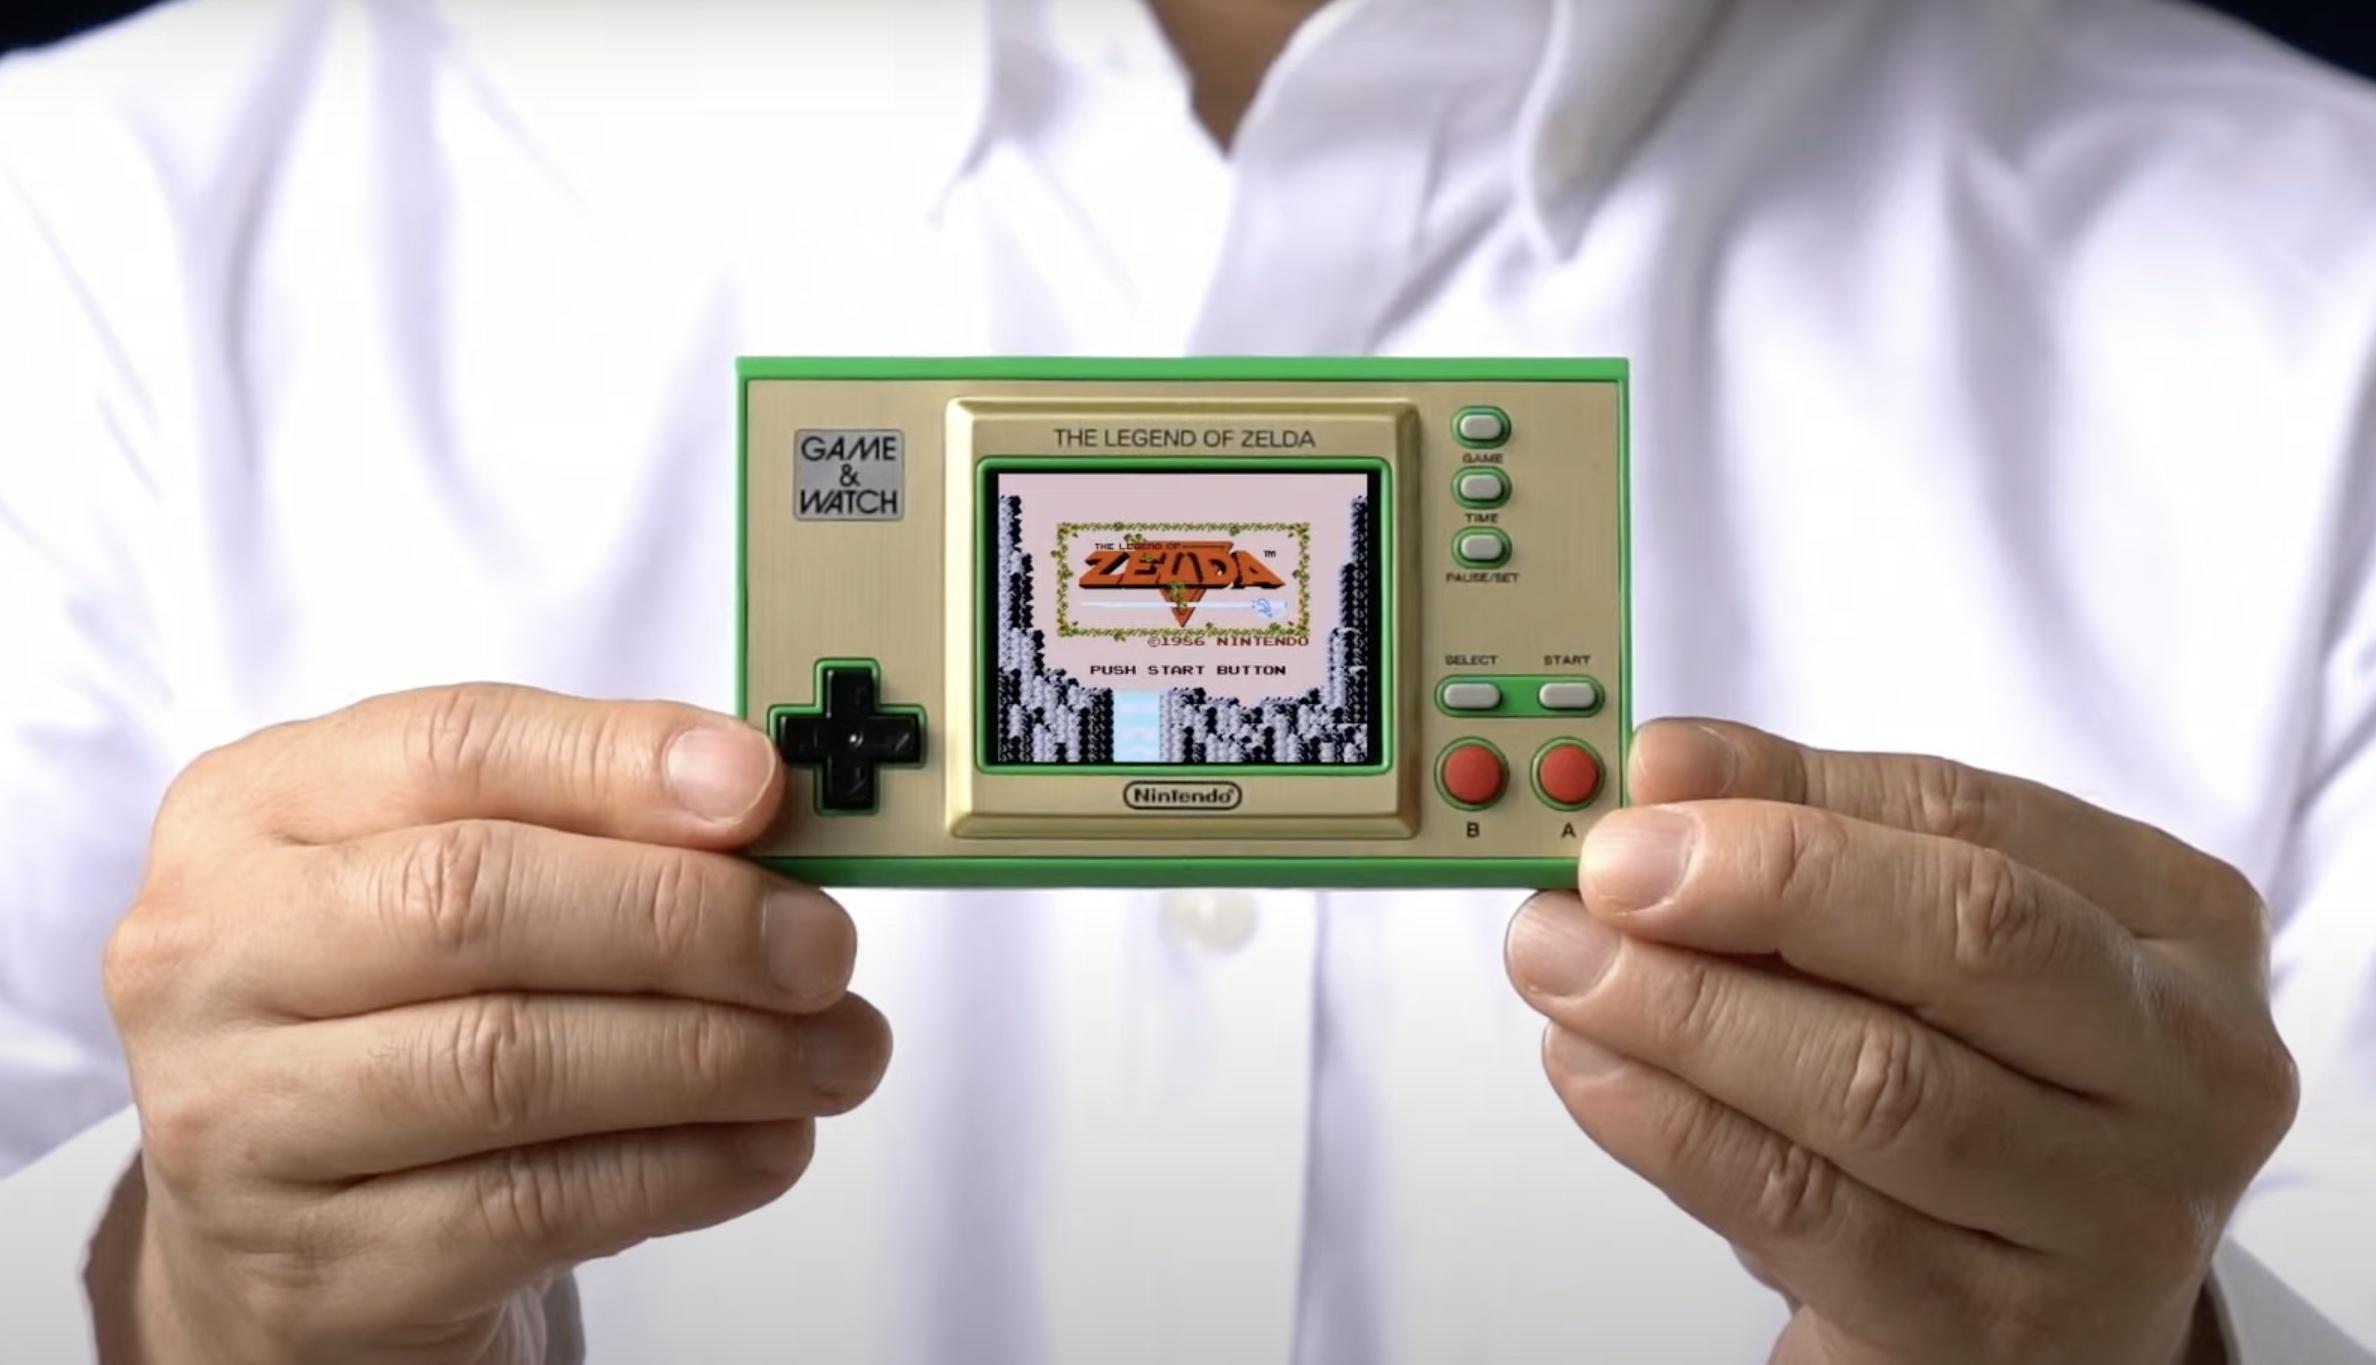 薩爾達傳說 Legend of Zelda Game & Watch